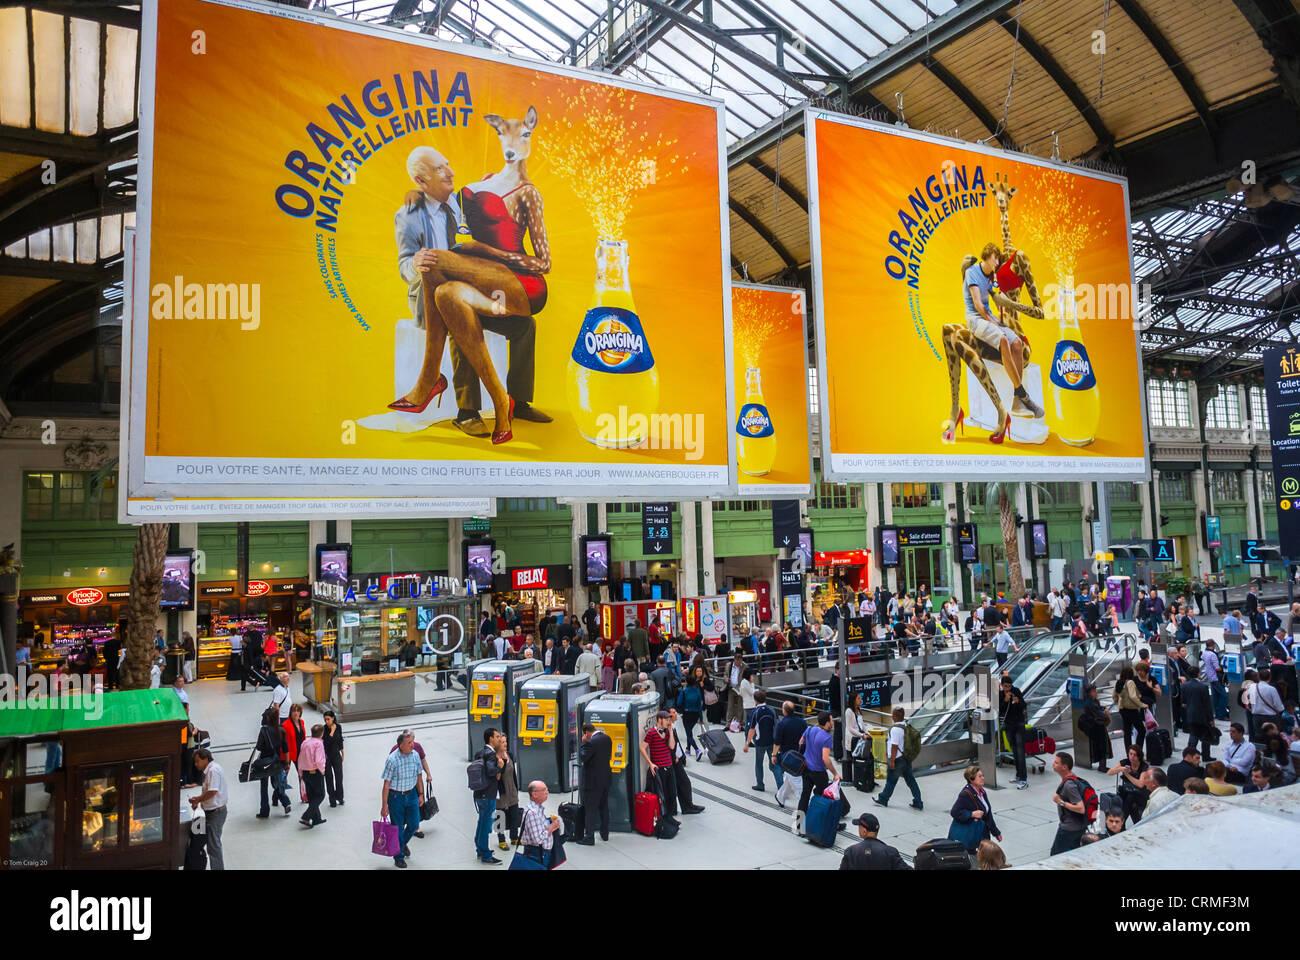 "Paris, France, French Soft drink Advertising Billboards in Train Station, ""Gare de Lyon"", Orangina (Coca Cola) Stock Photo"